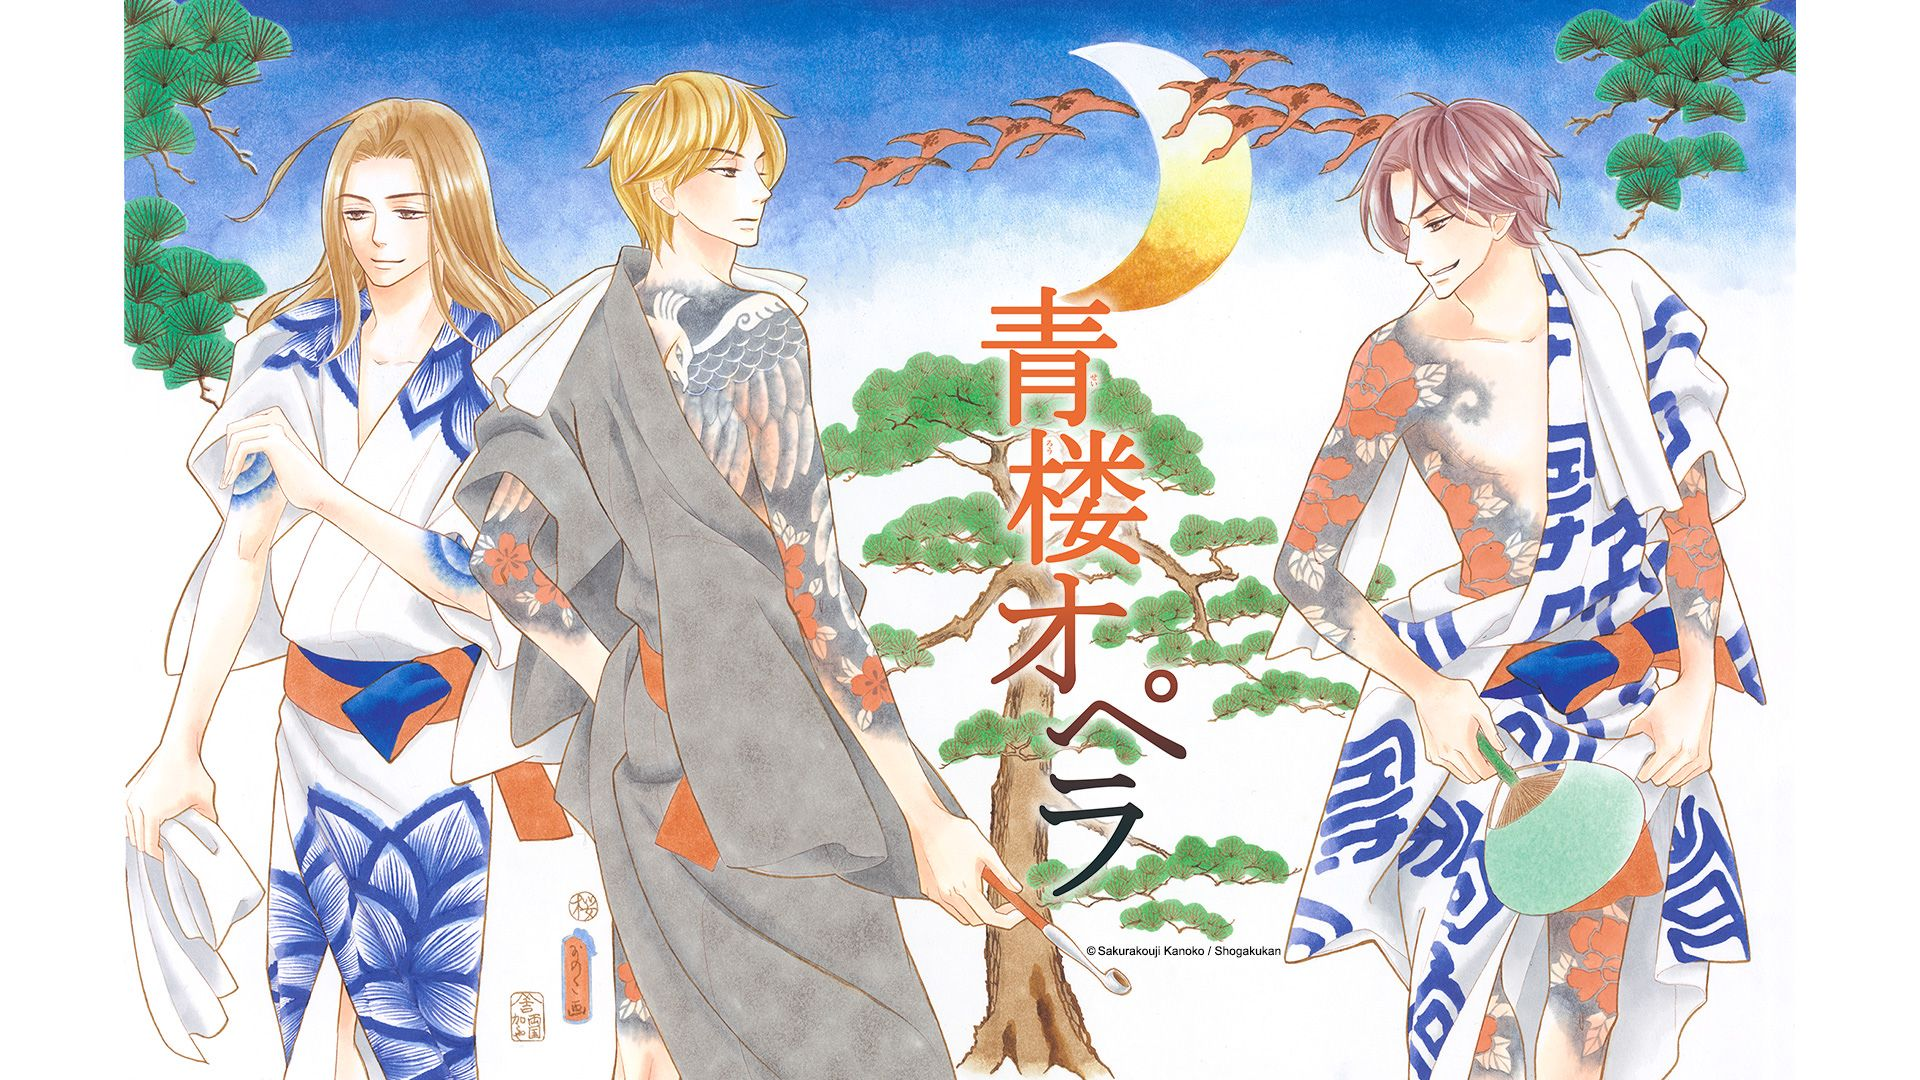 Imgur Manga artist, Artist, Zelda characters